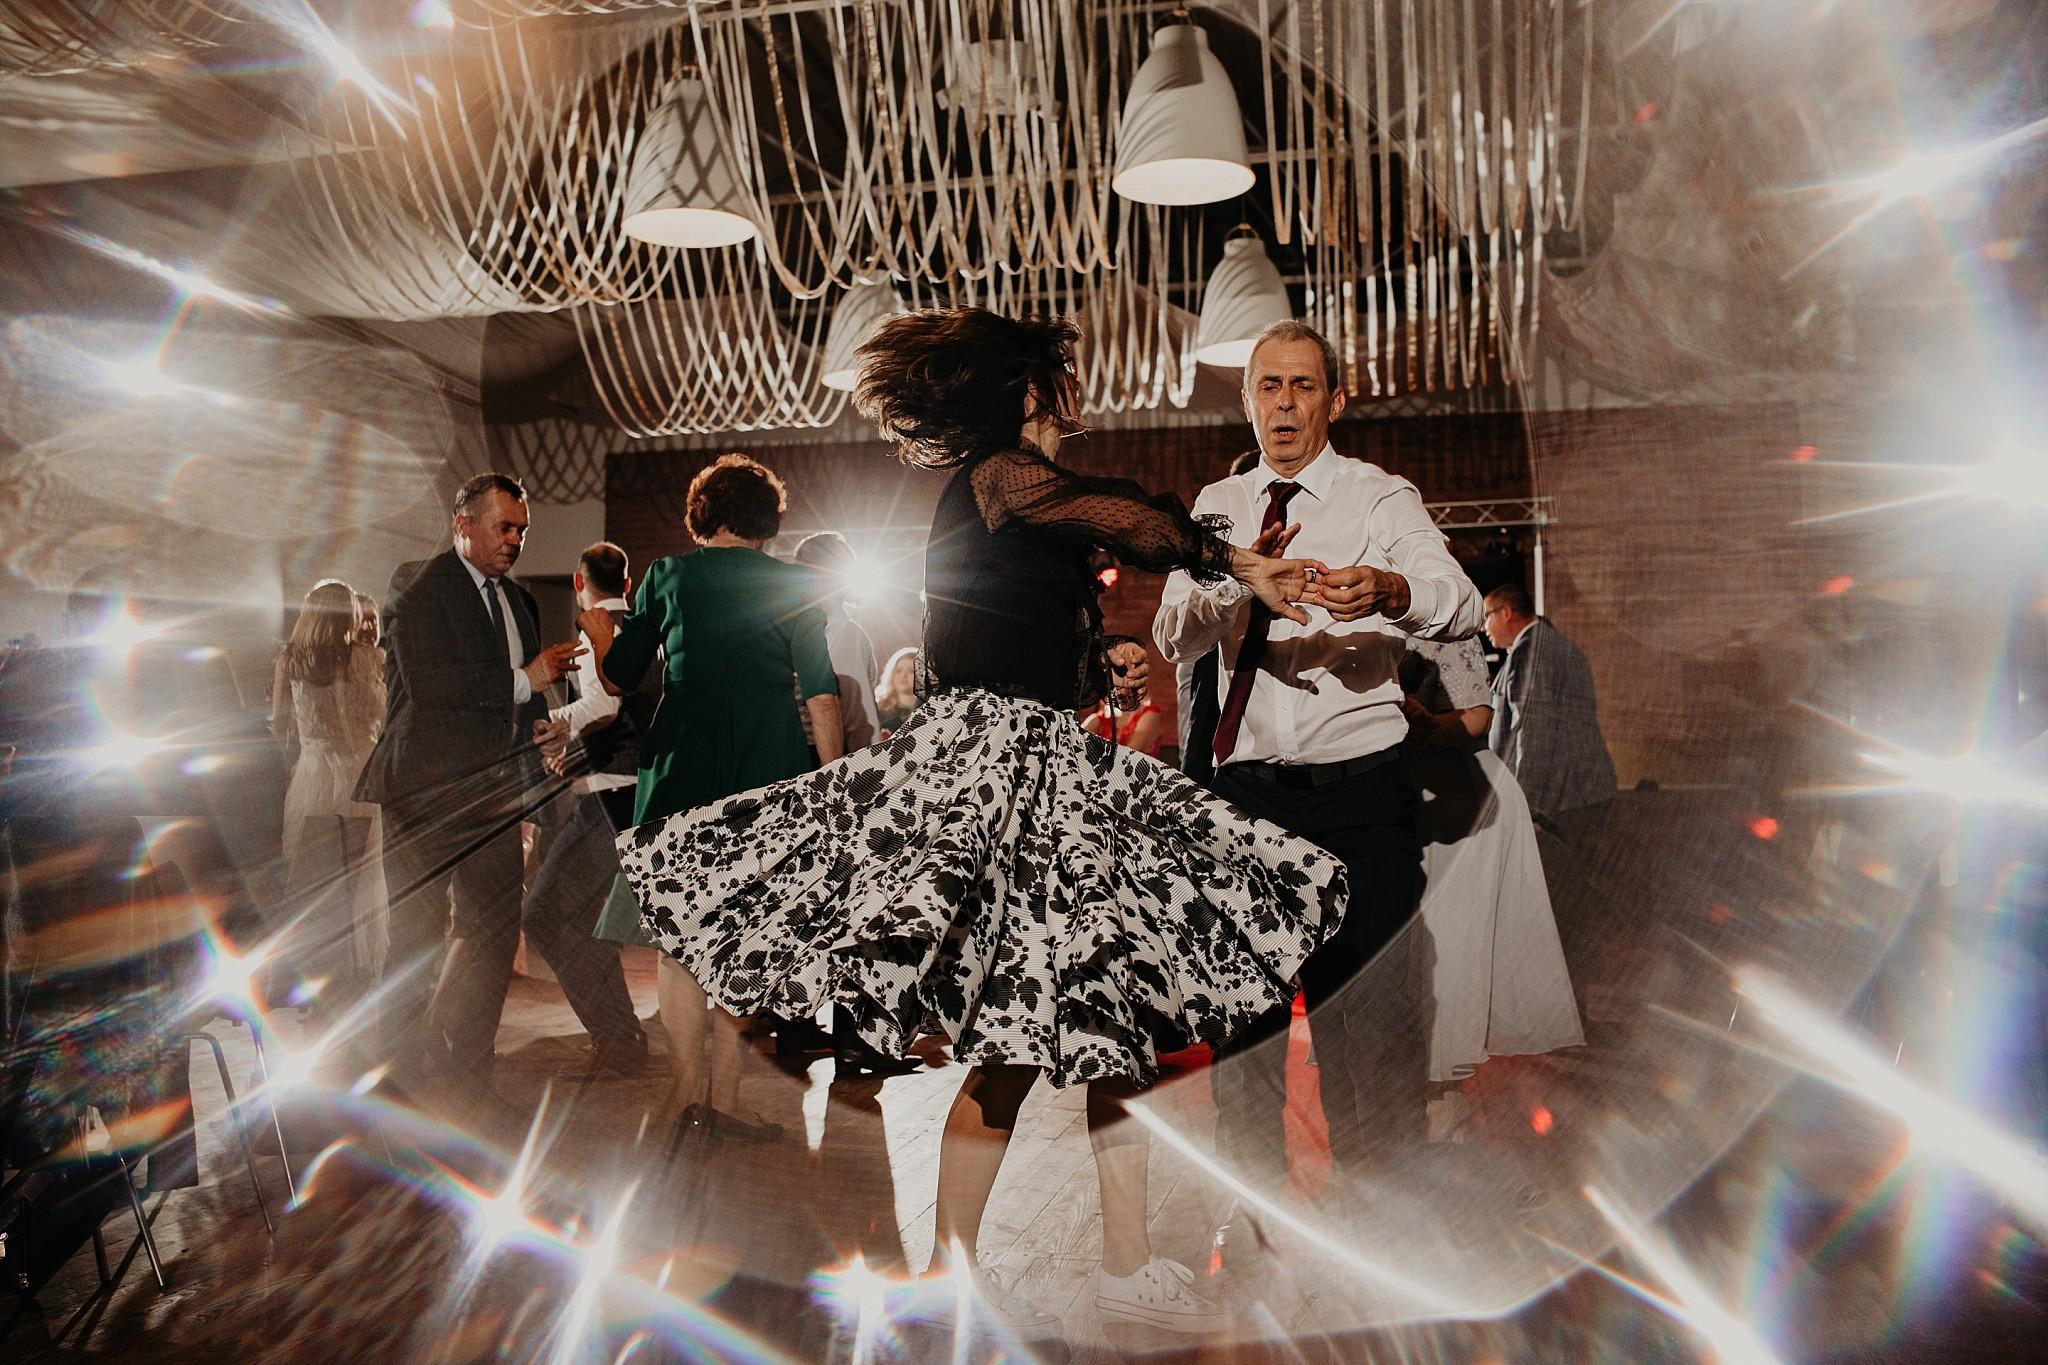 fotograf poznan wesele dobra truskawka piekne wesele pod poznaniem wesele w dobrej truskawce piekna para mloda slub marzen slub koronawirus slub listopad wesele koronawirus 426